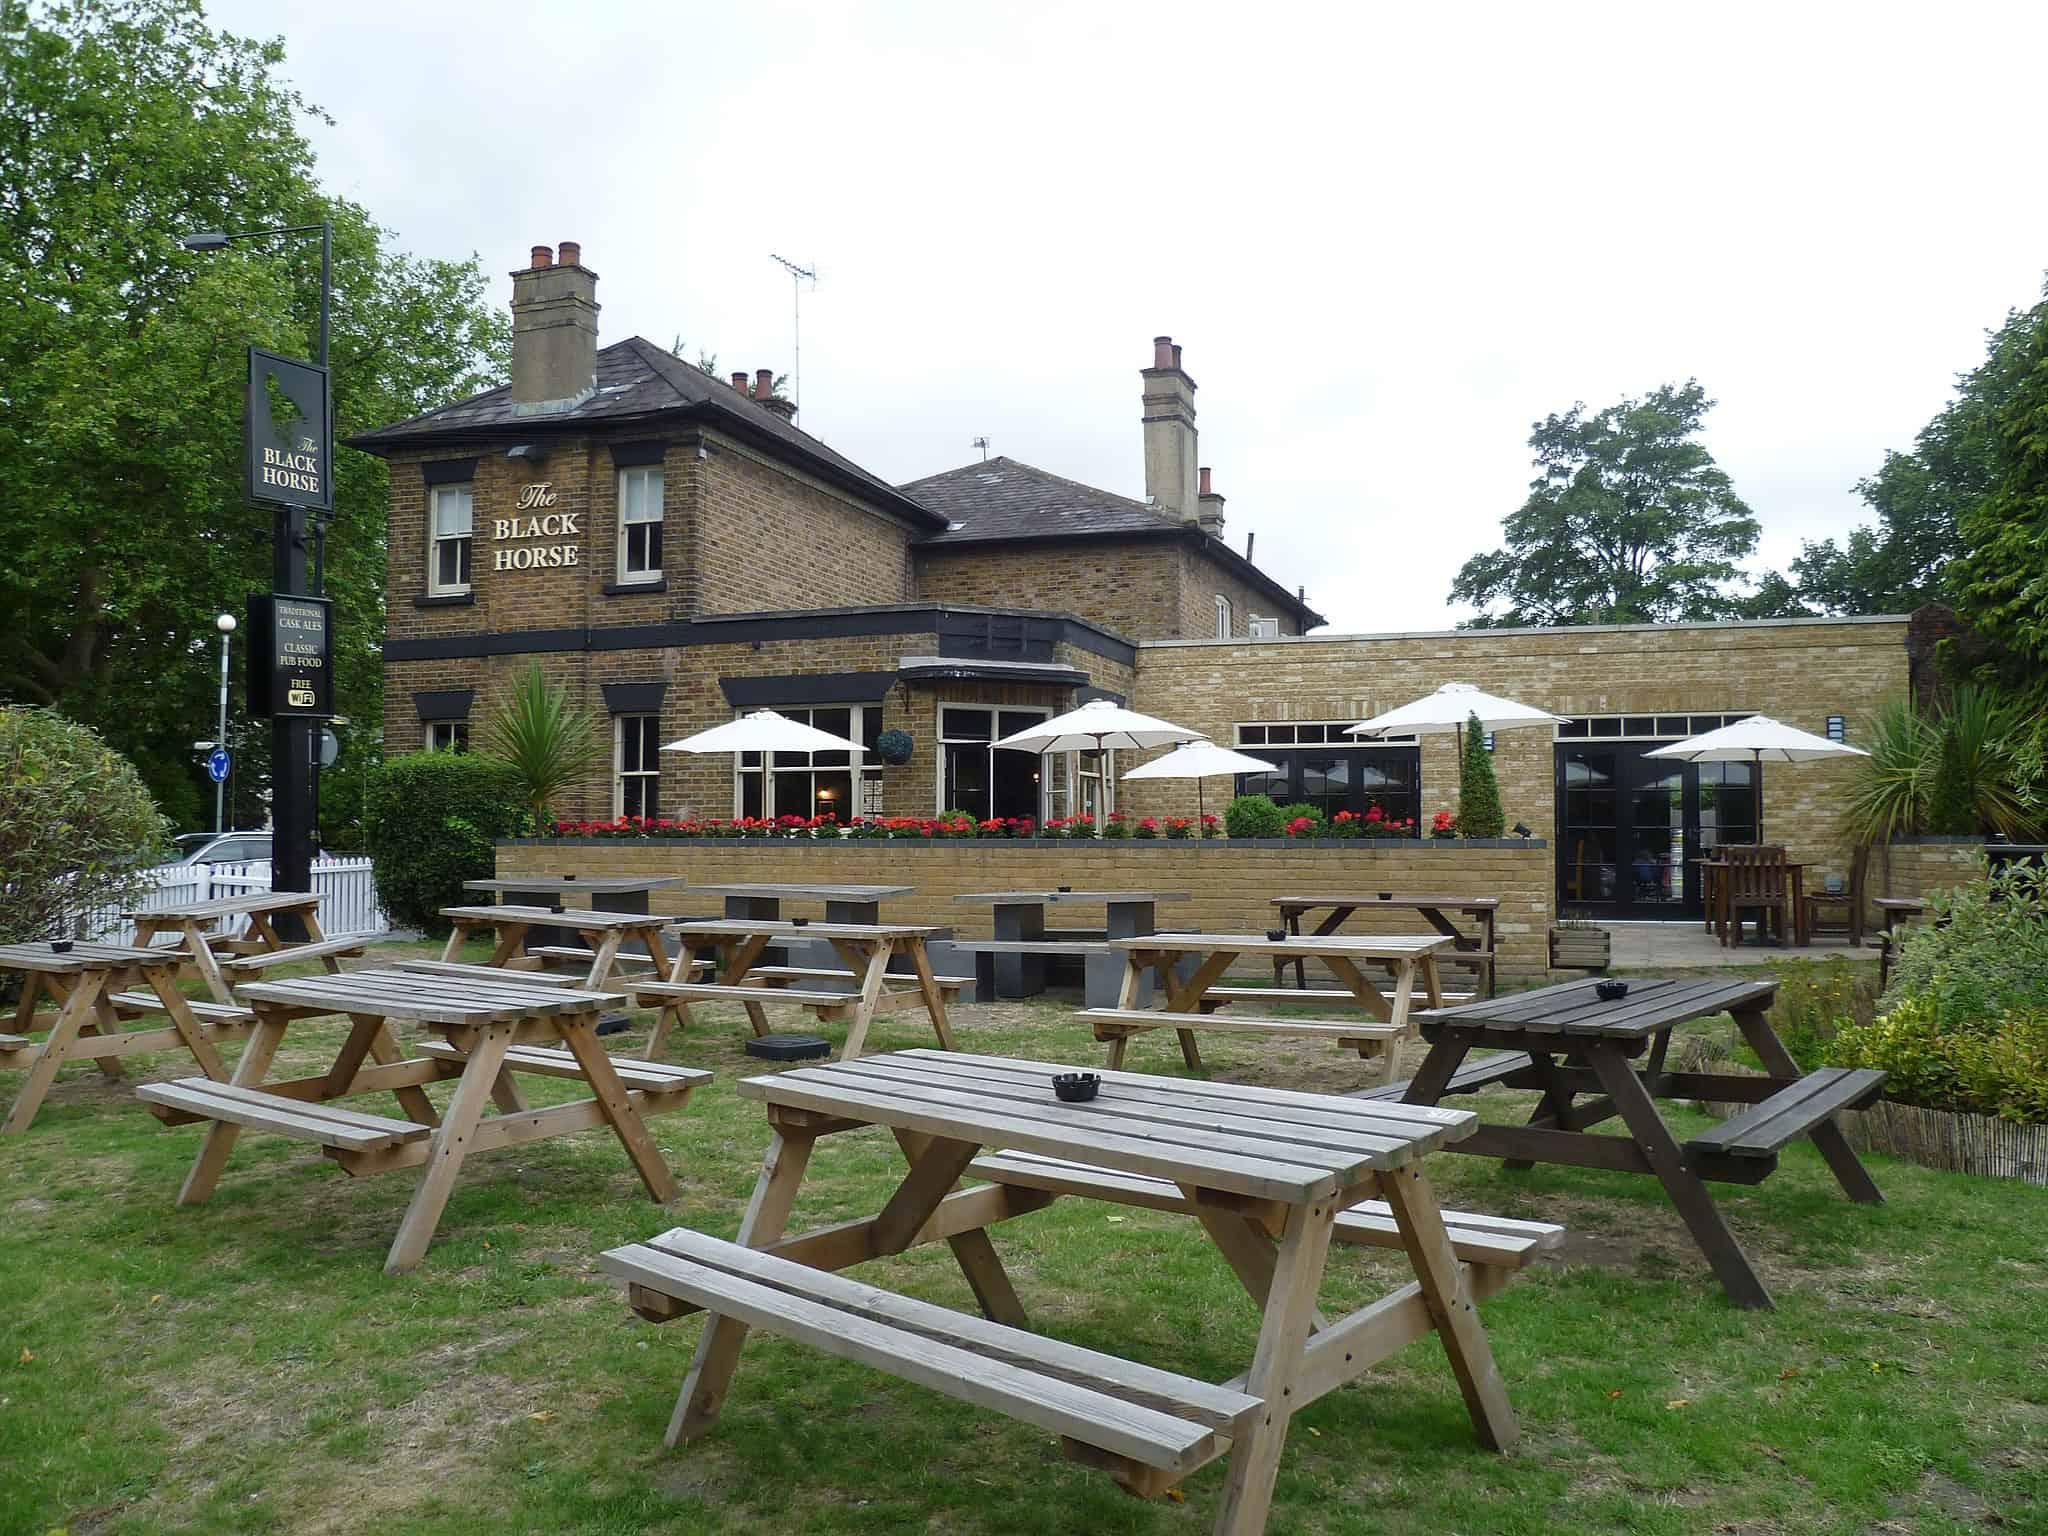 The_Black_Horse_pub,_Chipping_Barnet Philafrenzy, CC BY-SA 4.0, via Wikimedia Commons